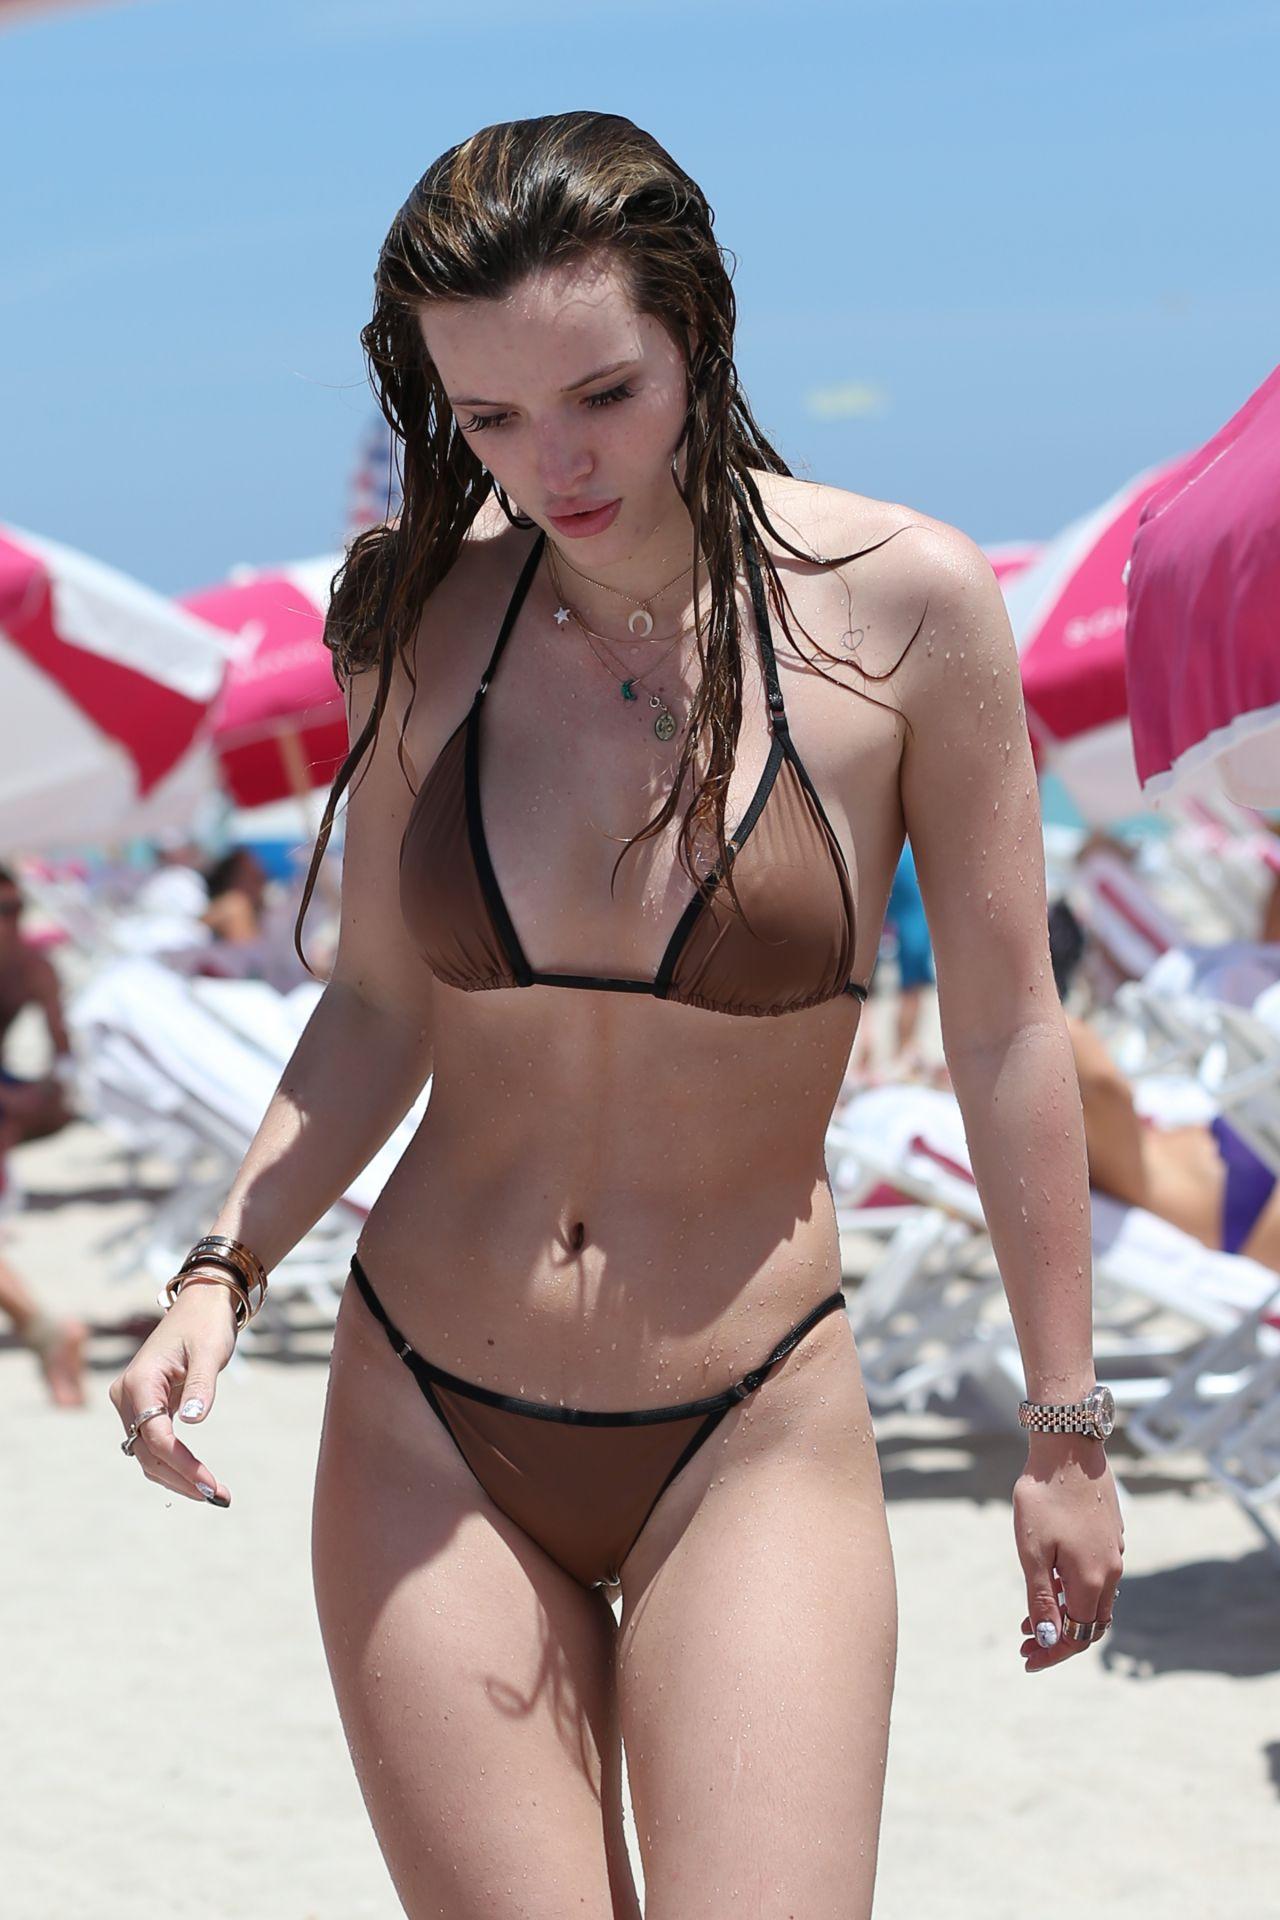 Bikini Kaili Thorne naked (55 photos), Ass, Leaked, Feet, butt 2019